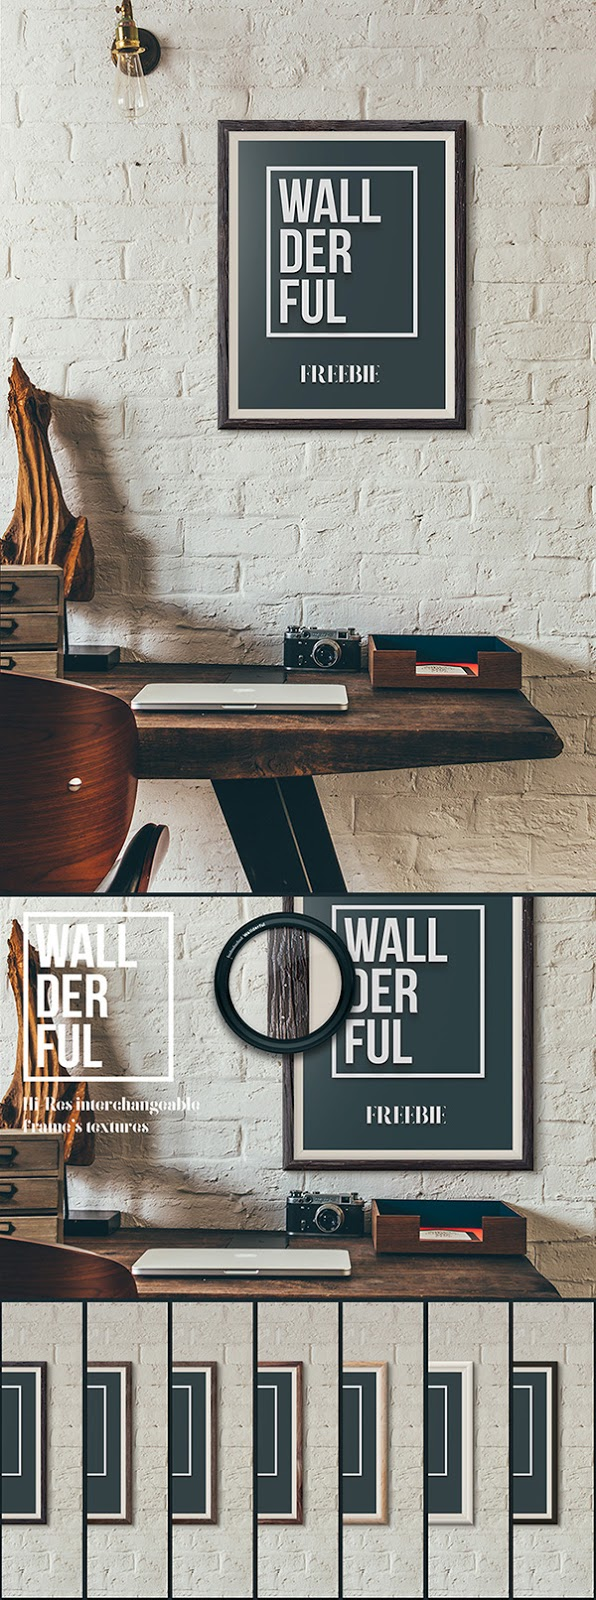 Download Poster Mockup PSD Terbaru Gratis - Wallderful Free Frame Mockups